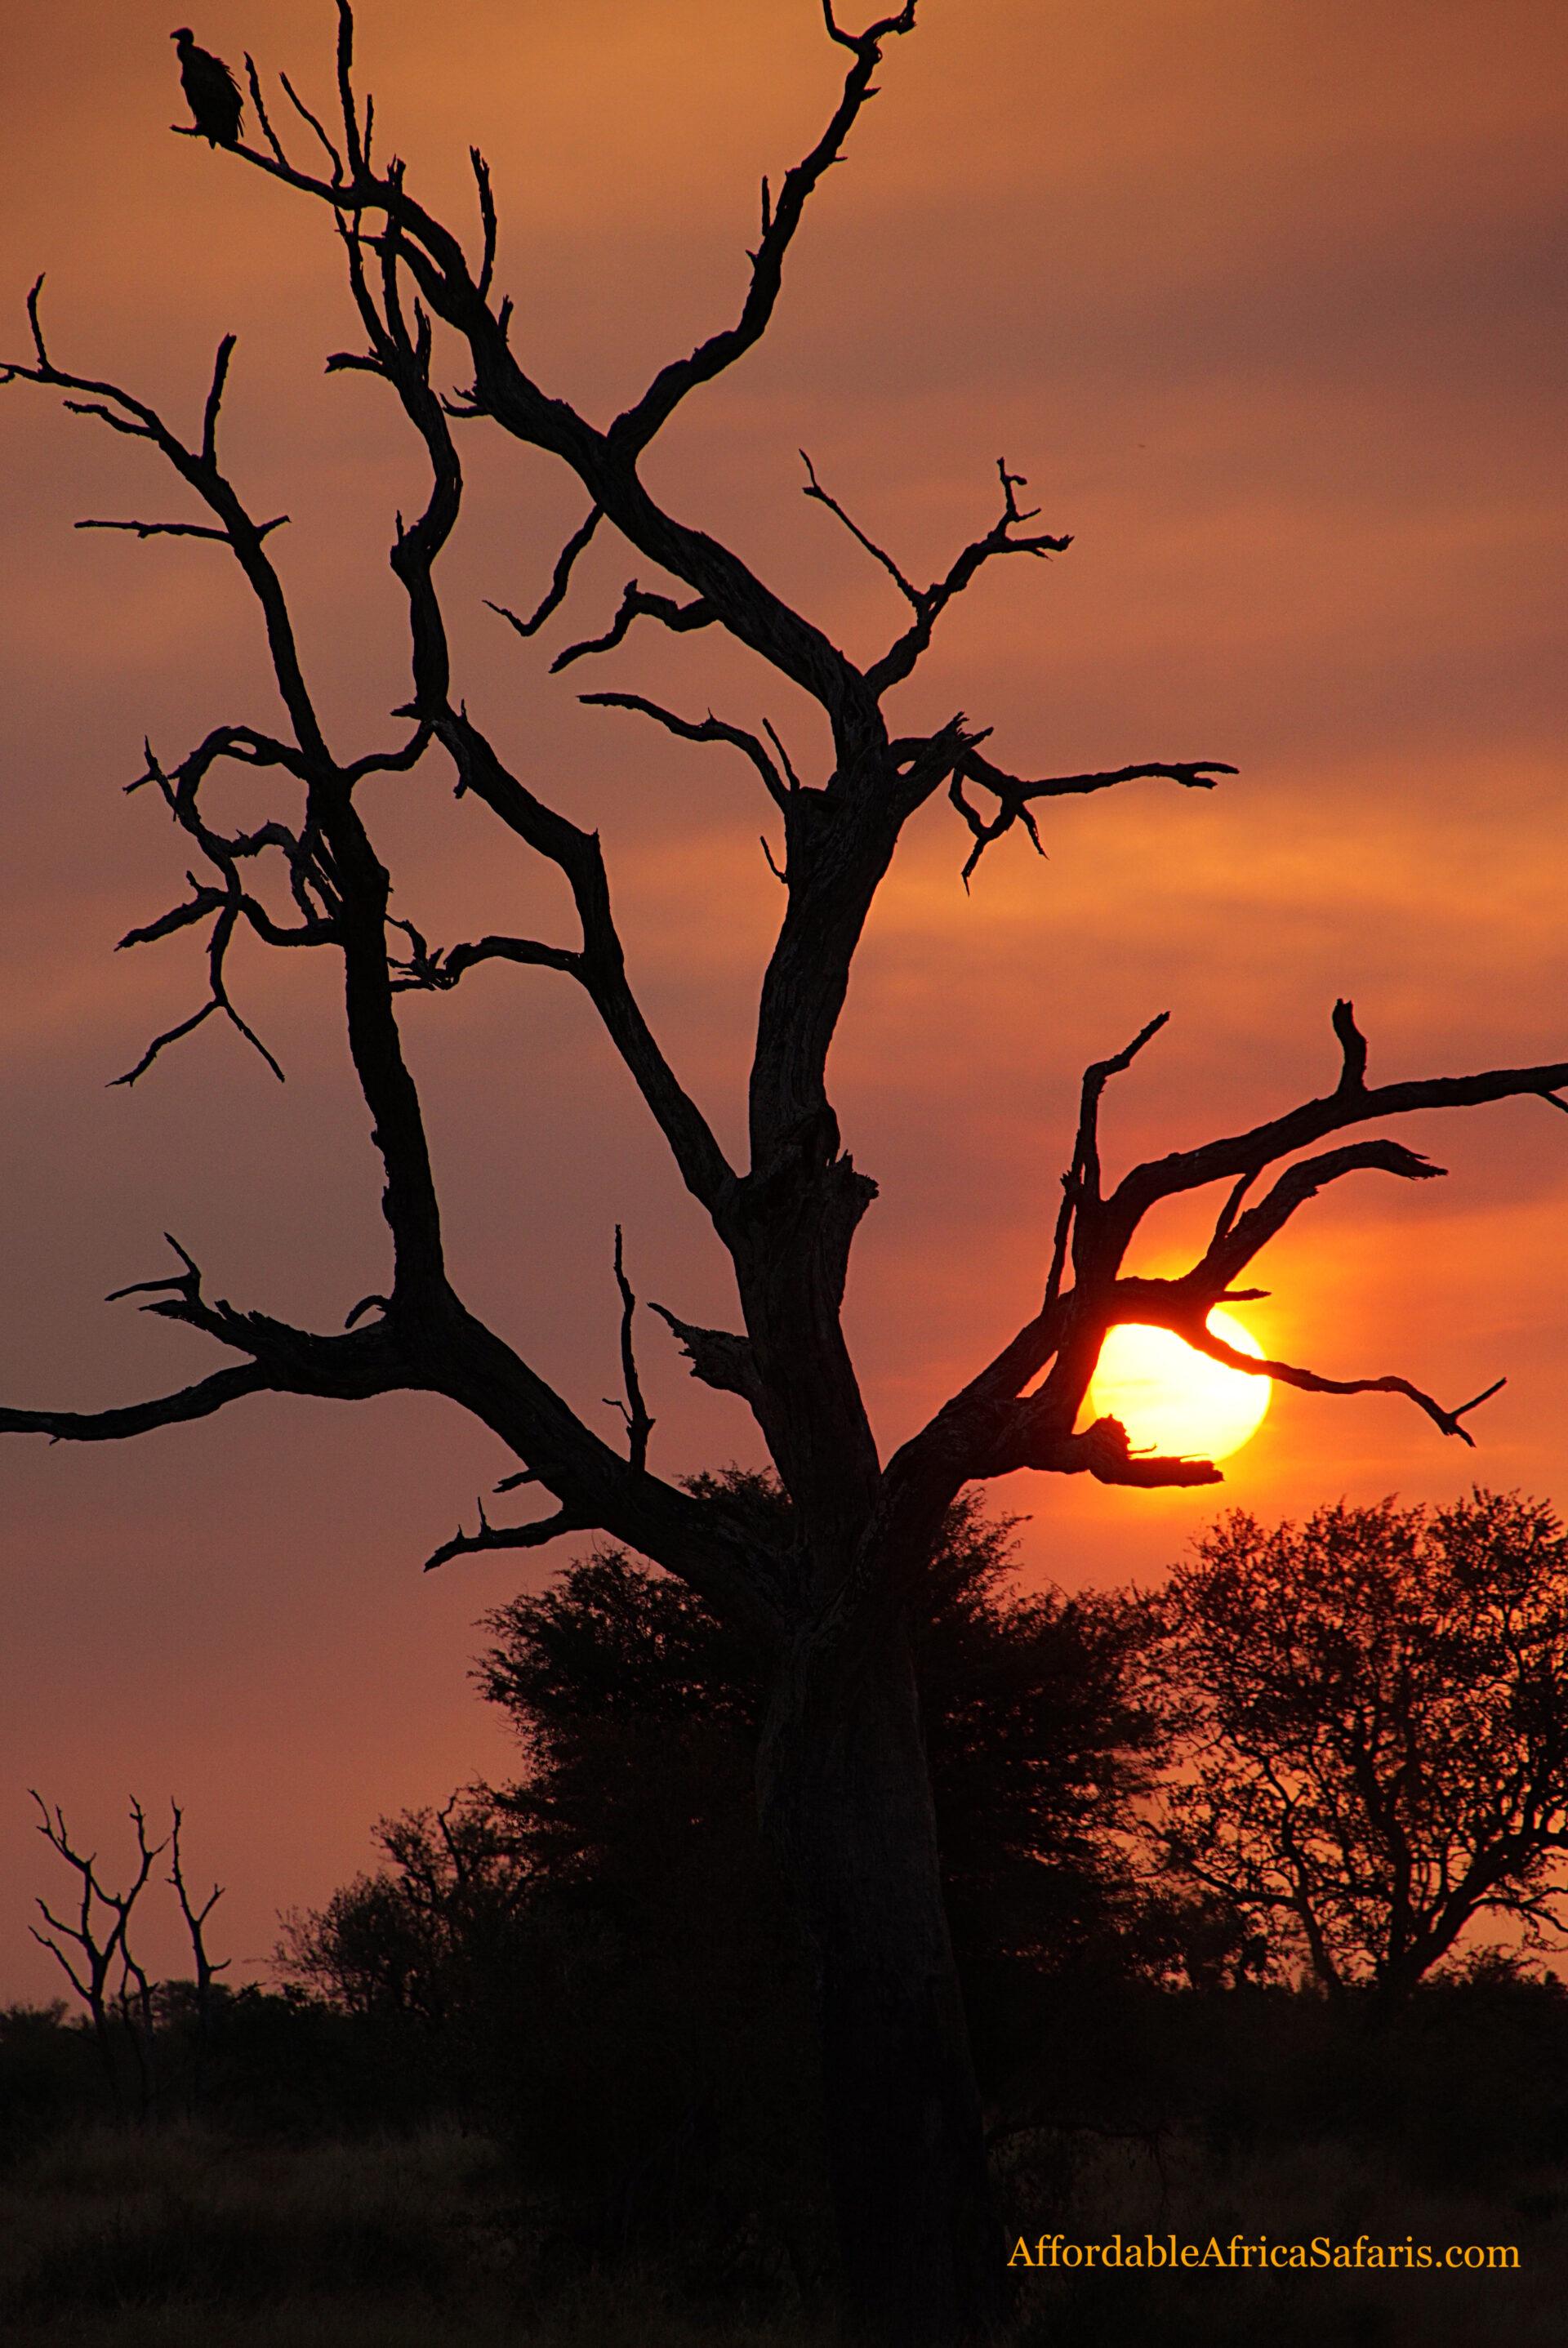 Sun sets on a tree branch